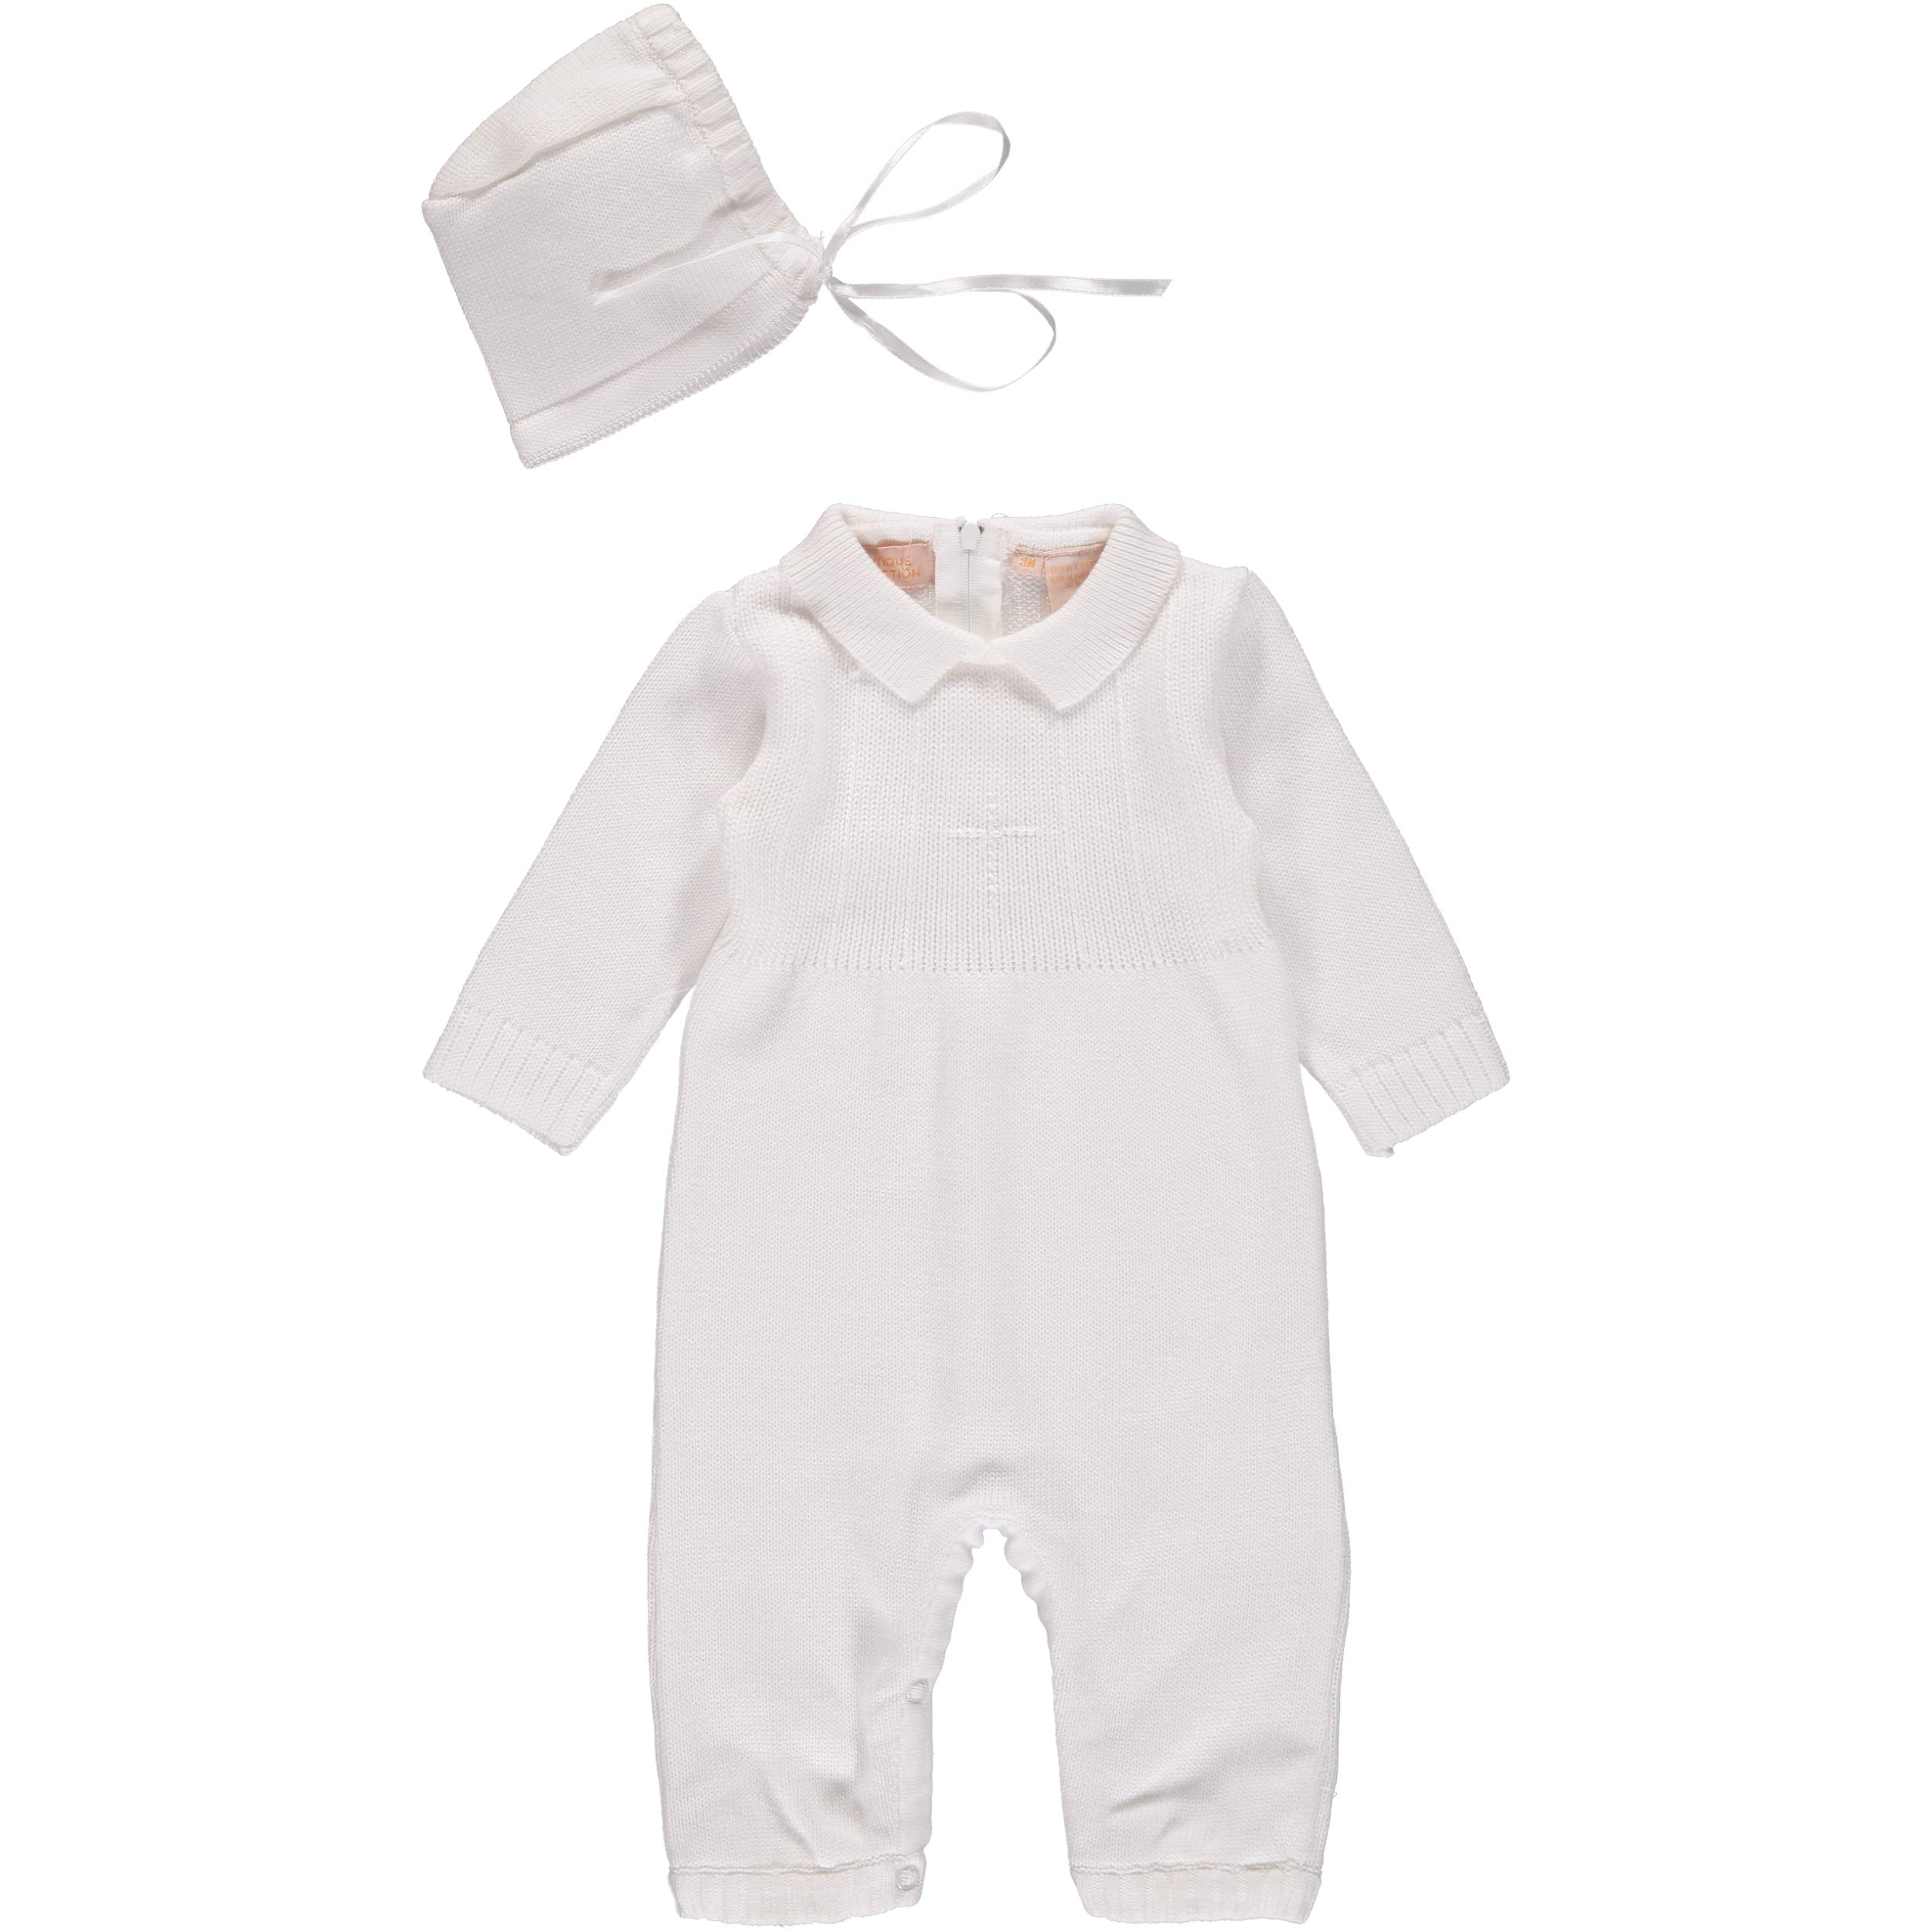 Boys' Clothing (newborn-5t) Baby Boys Gap Pants 12-18 Fine Workmanship Clothing, Shoes & Accessories